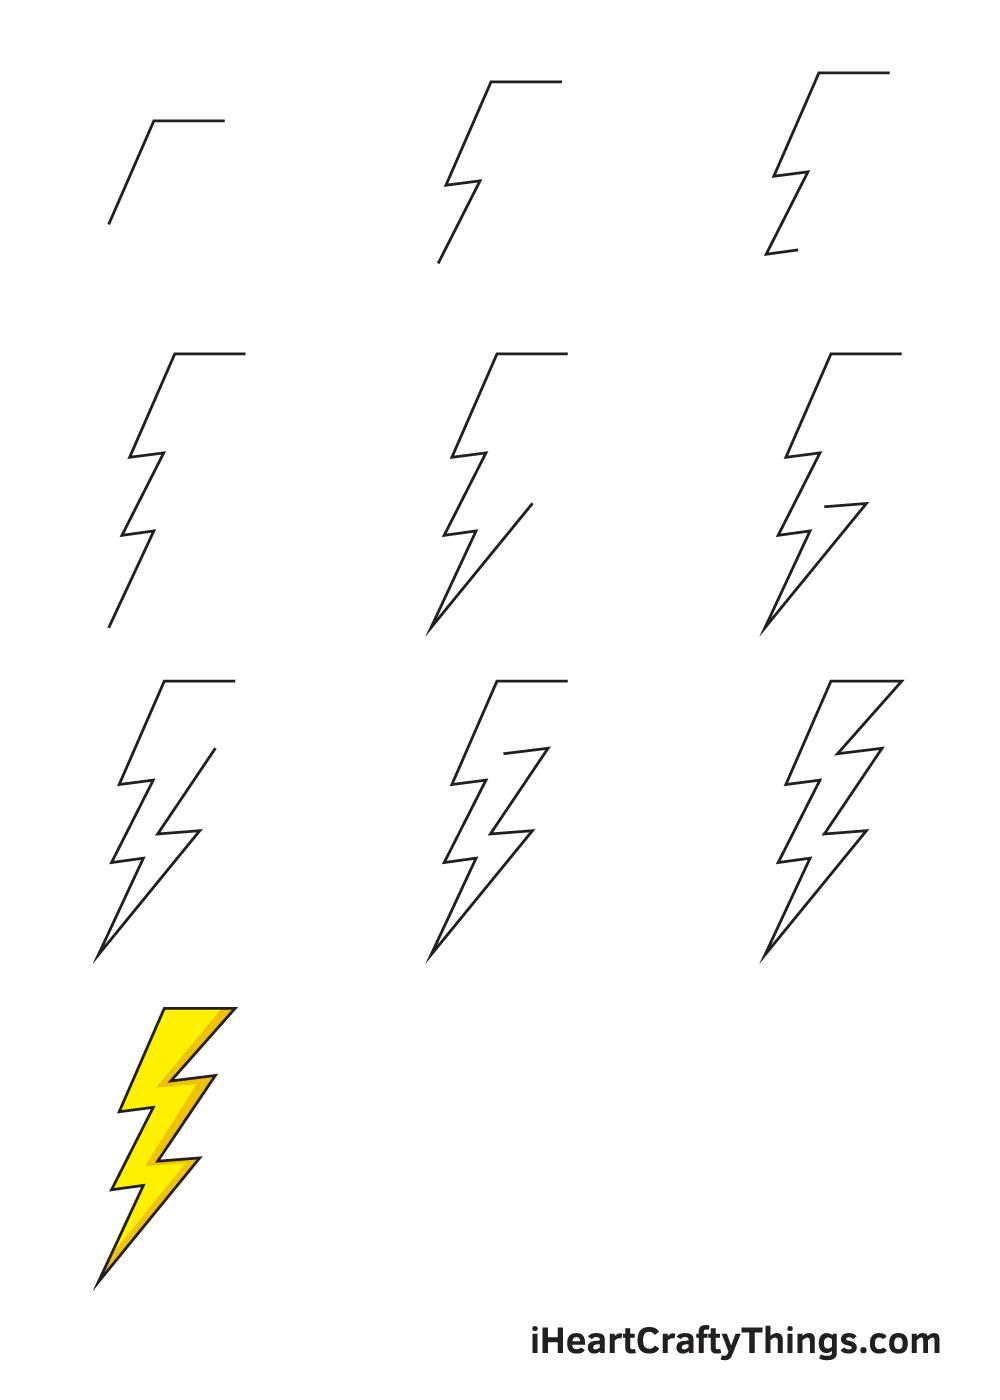 drawing lightning bolt in 9 steps